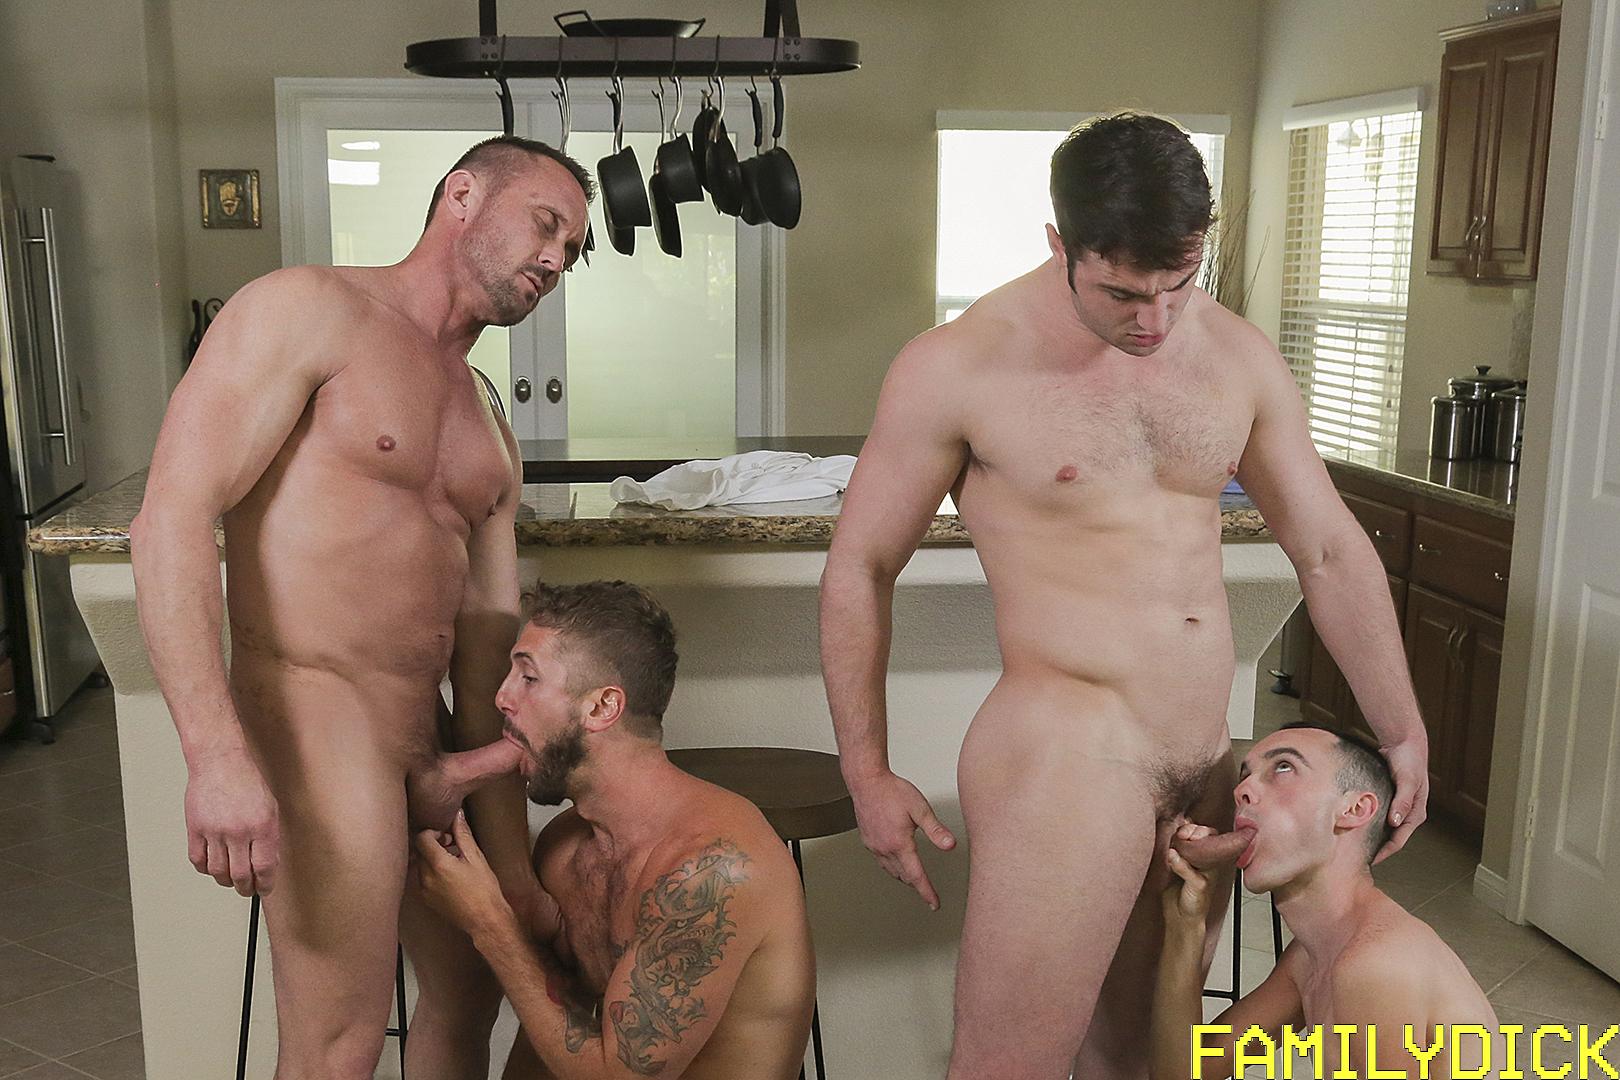 family-dick-dad-fucks-son-gay-porn-1